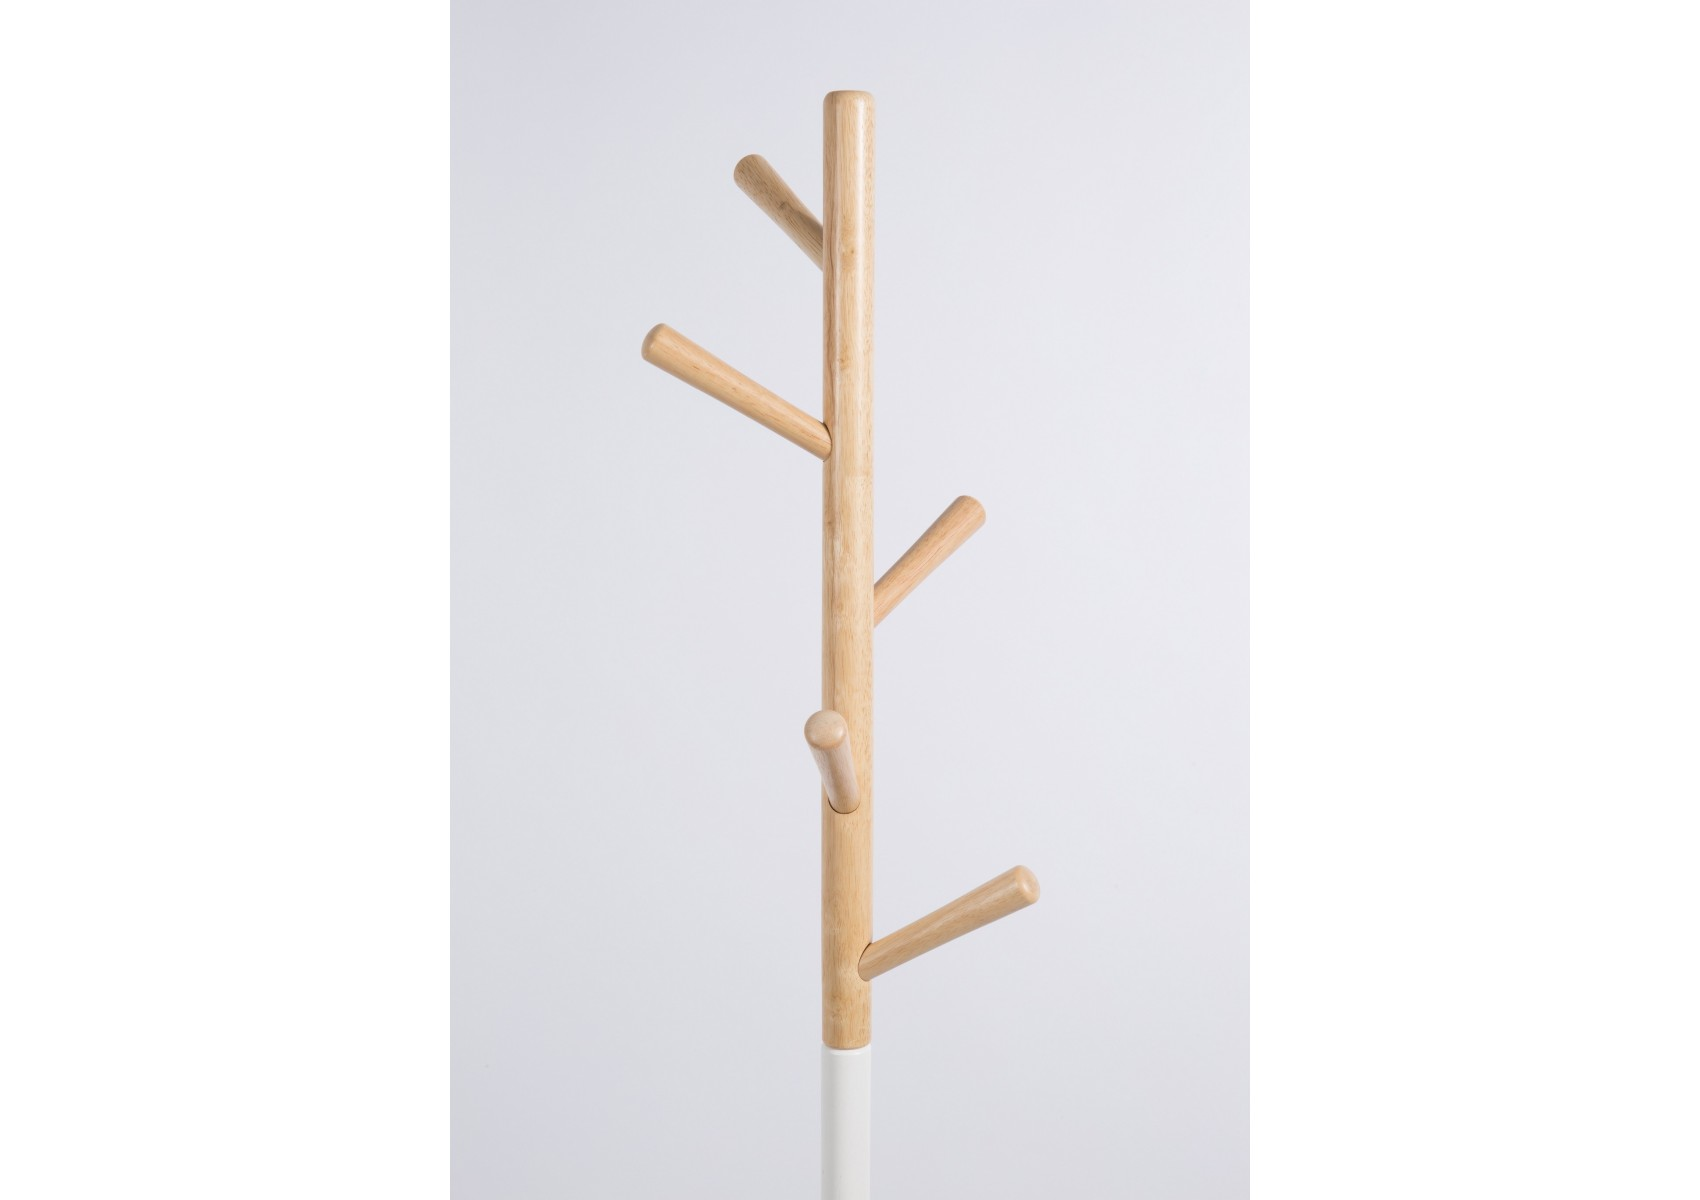 porte manteaux multifonctionnel table tree design scandinave boite design. Black Bedroom Furniture Sets. Home Design Ideas